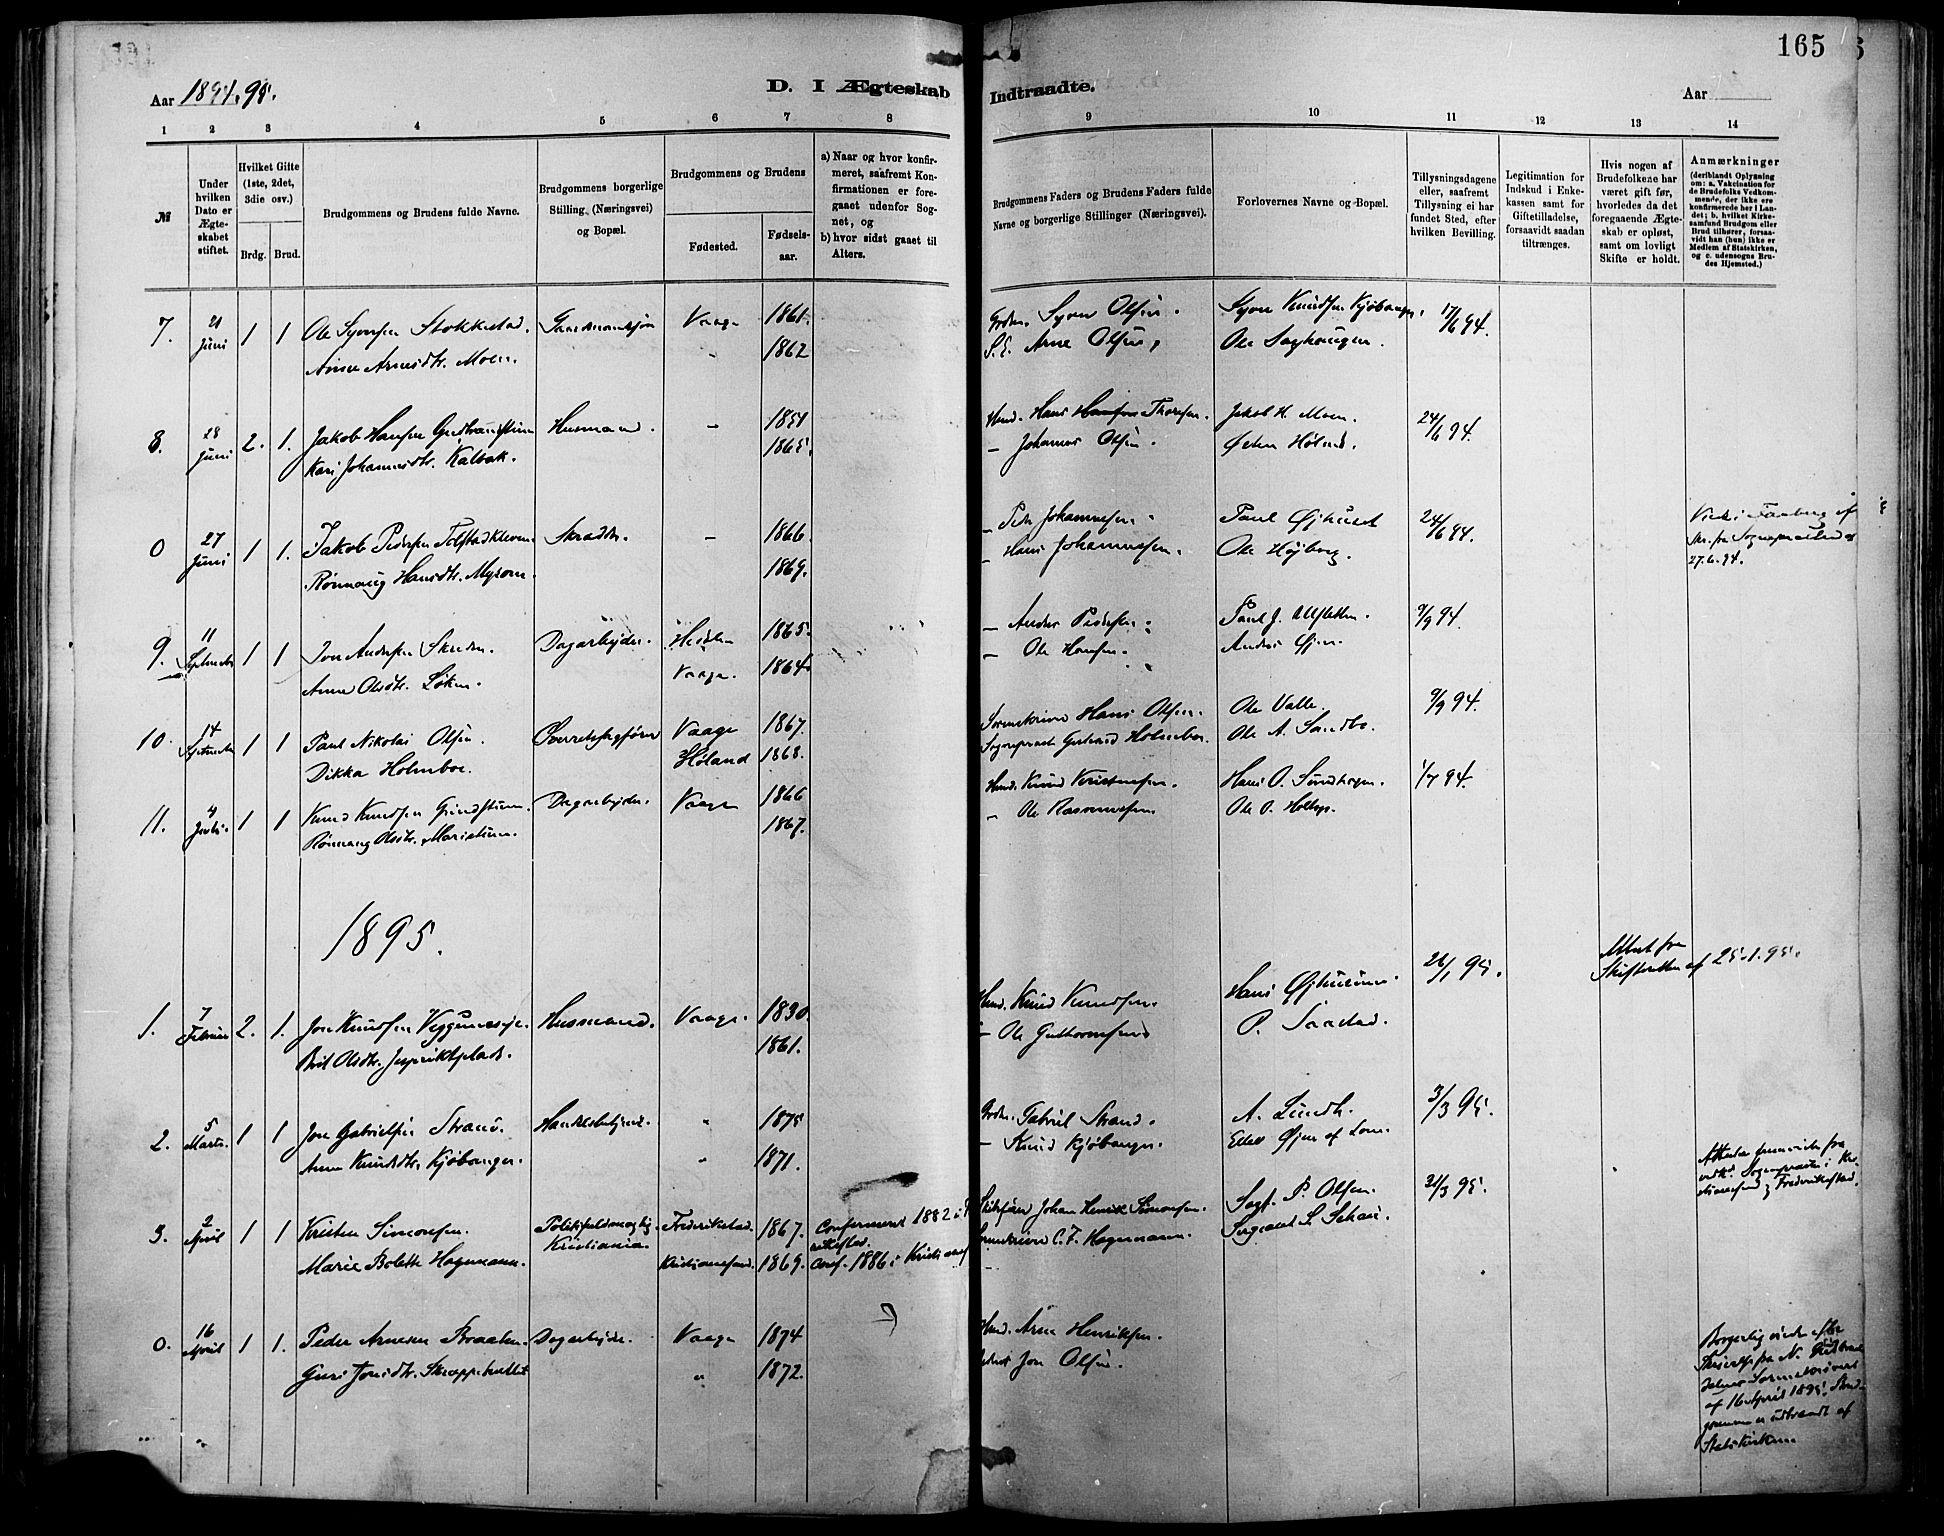 SAH, Vågå prestekontor, Ministerialbok nr. 9, 1886-1904, s. 165